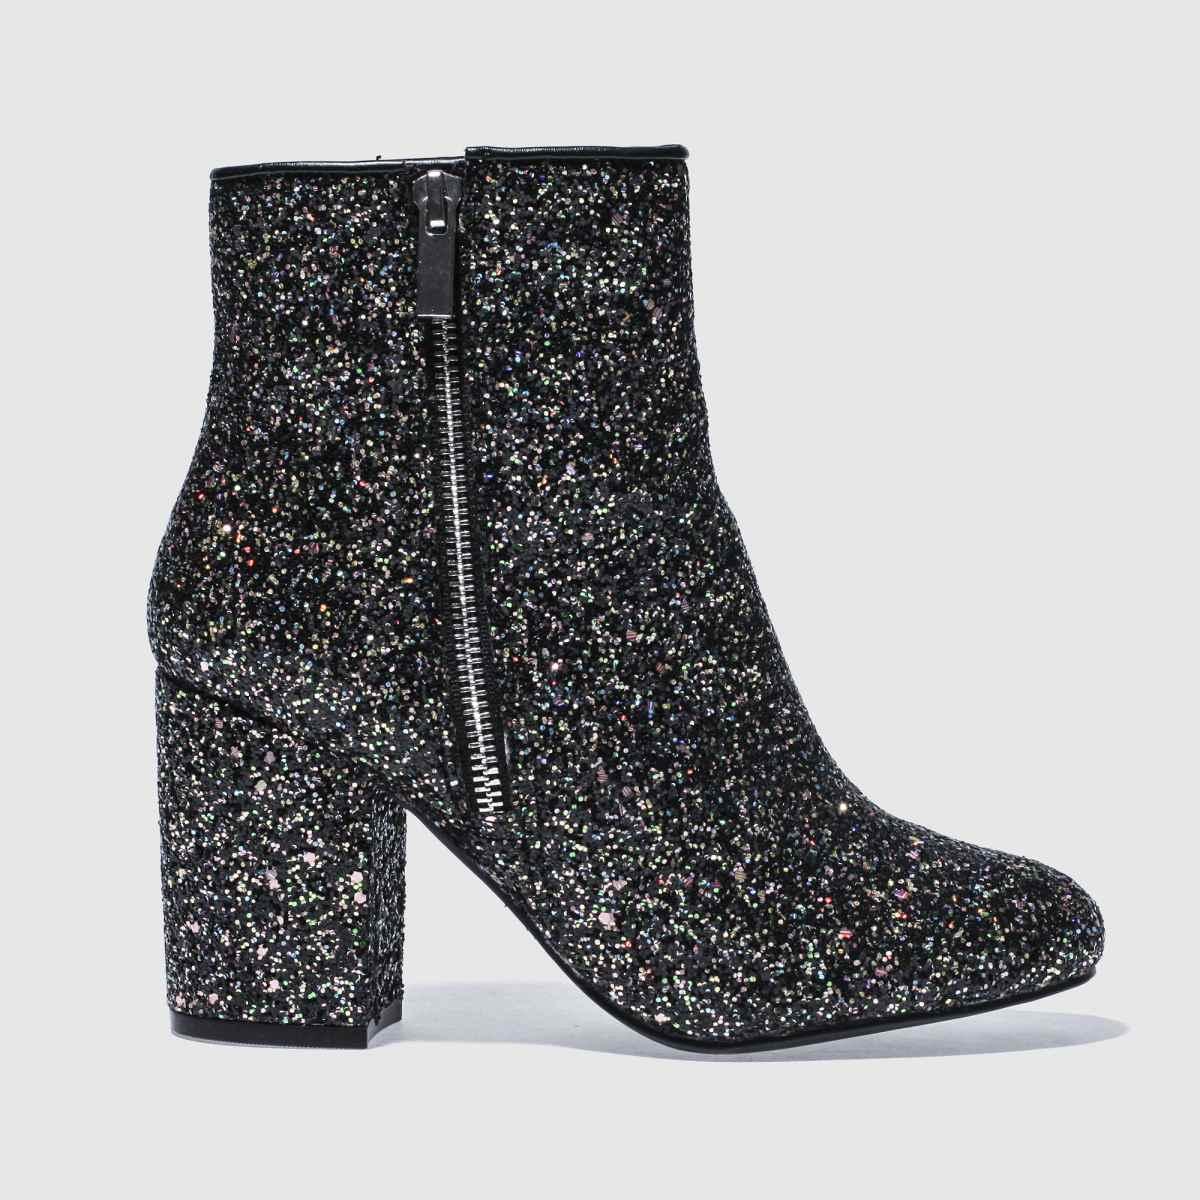 schuh black & silver premier boots